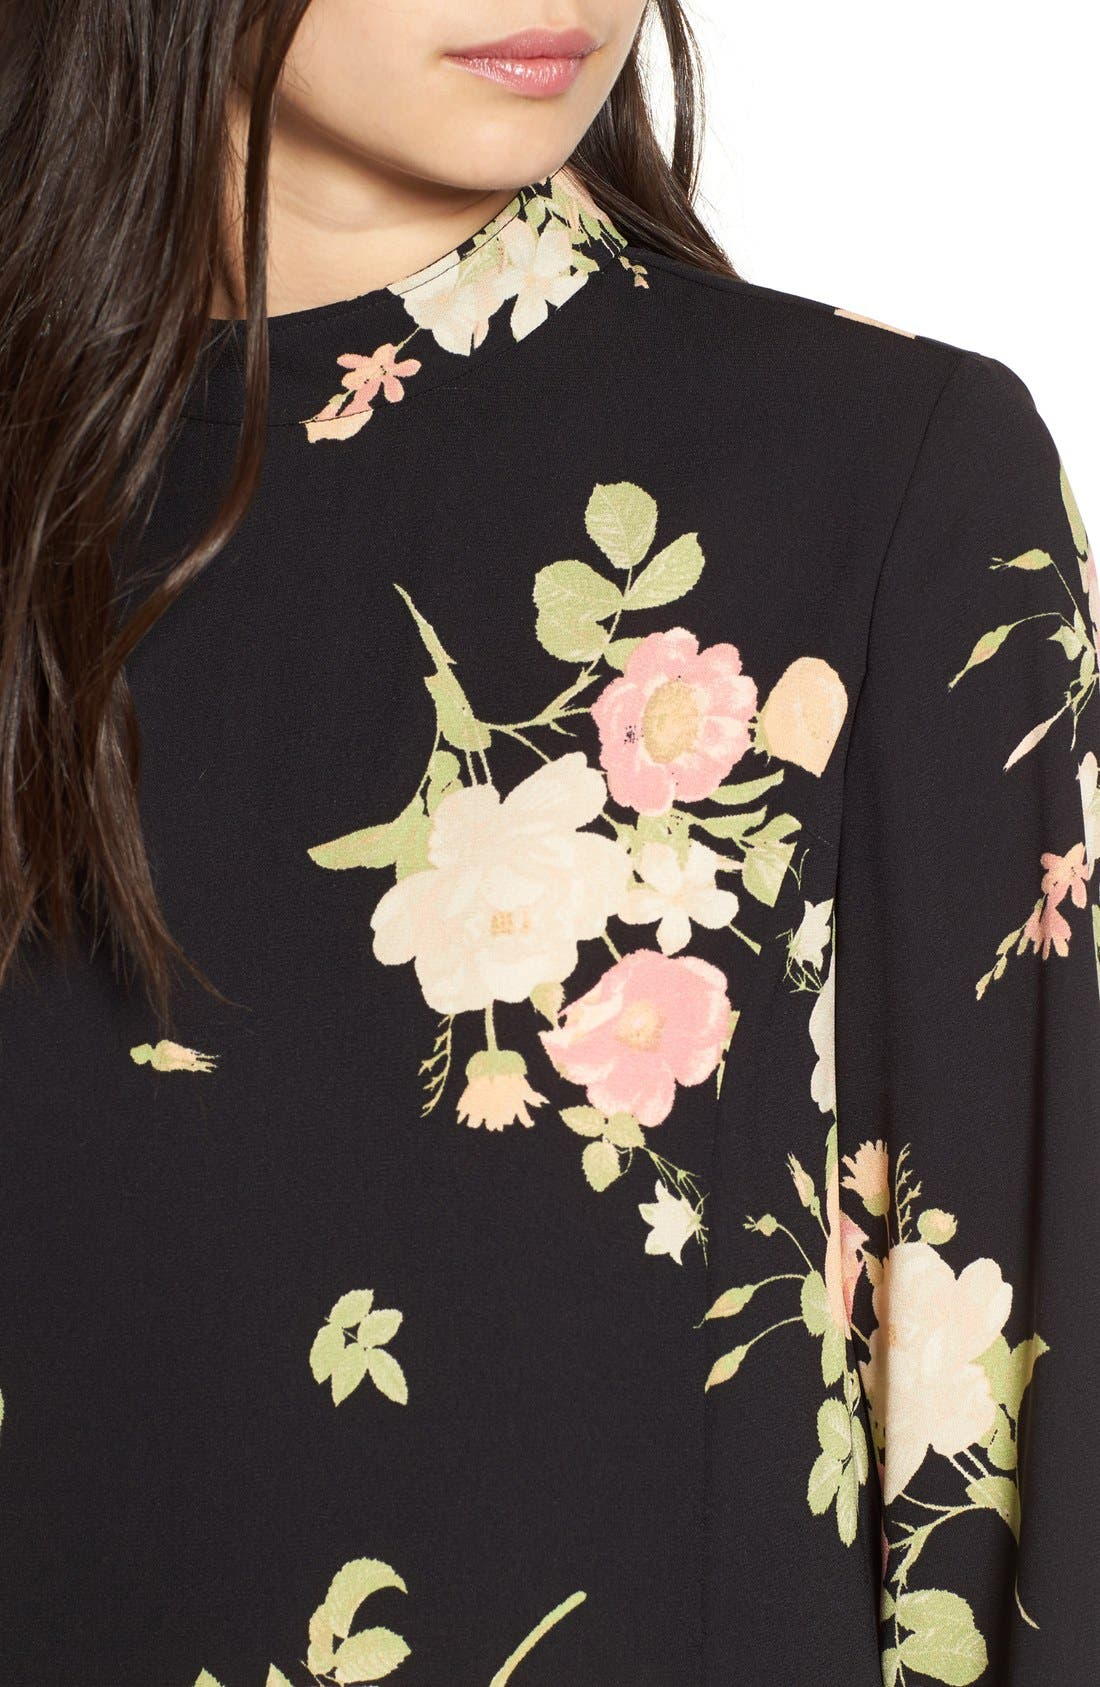 Floral Print Mock Neck Shift Dress,                             Alternate thumbnail 3, color,                             001